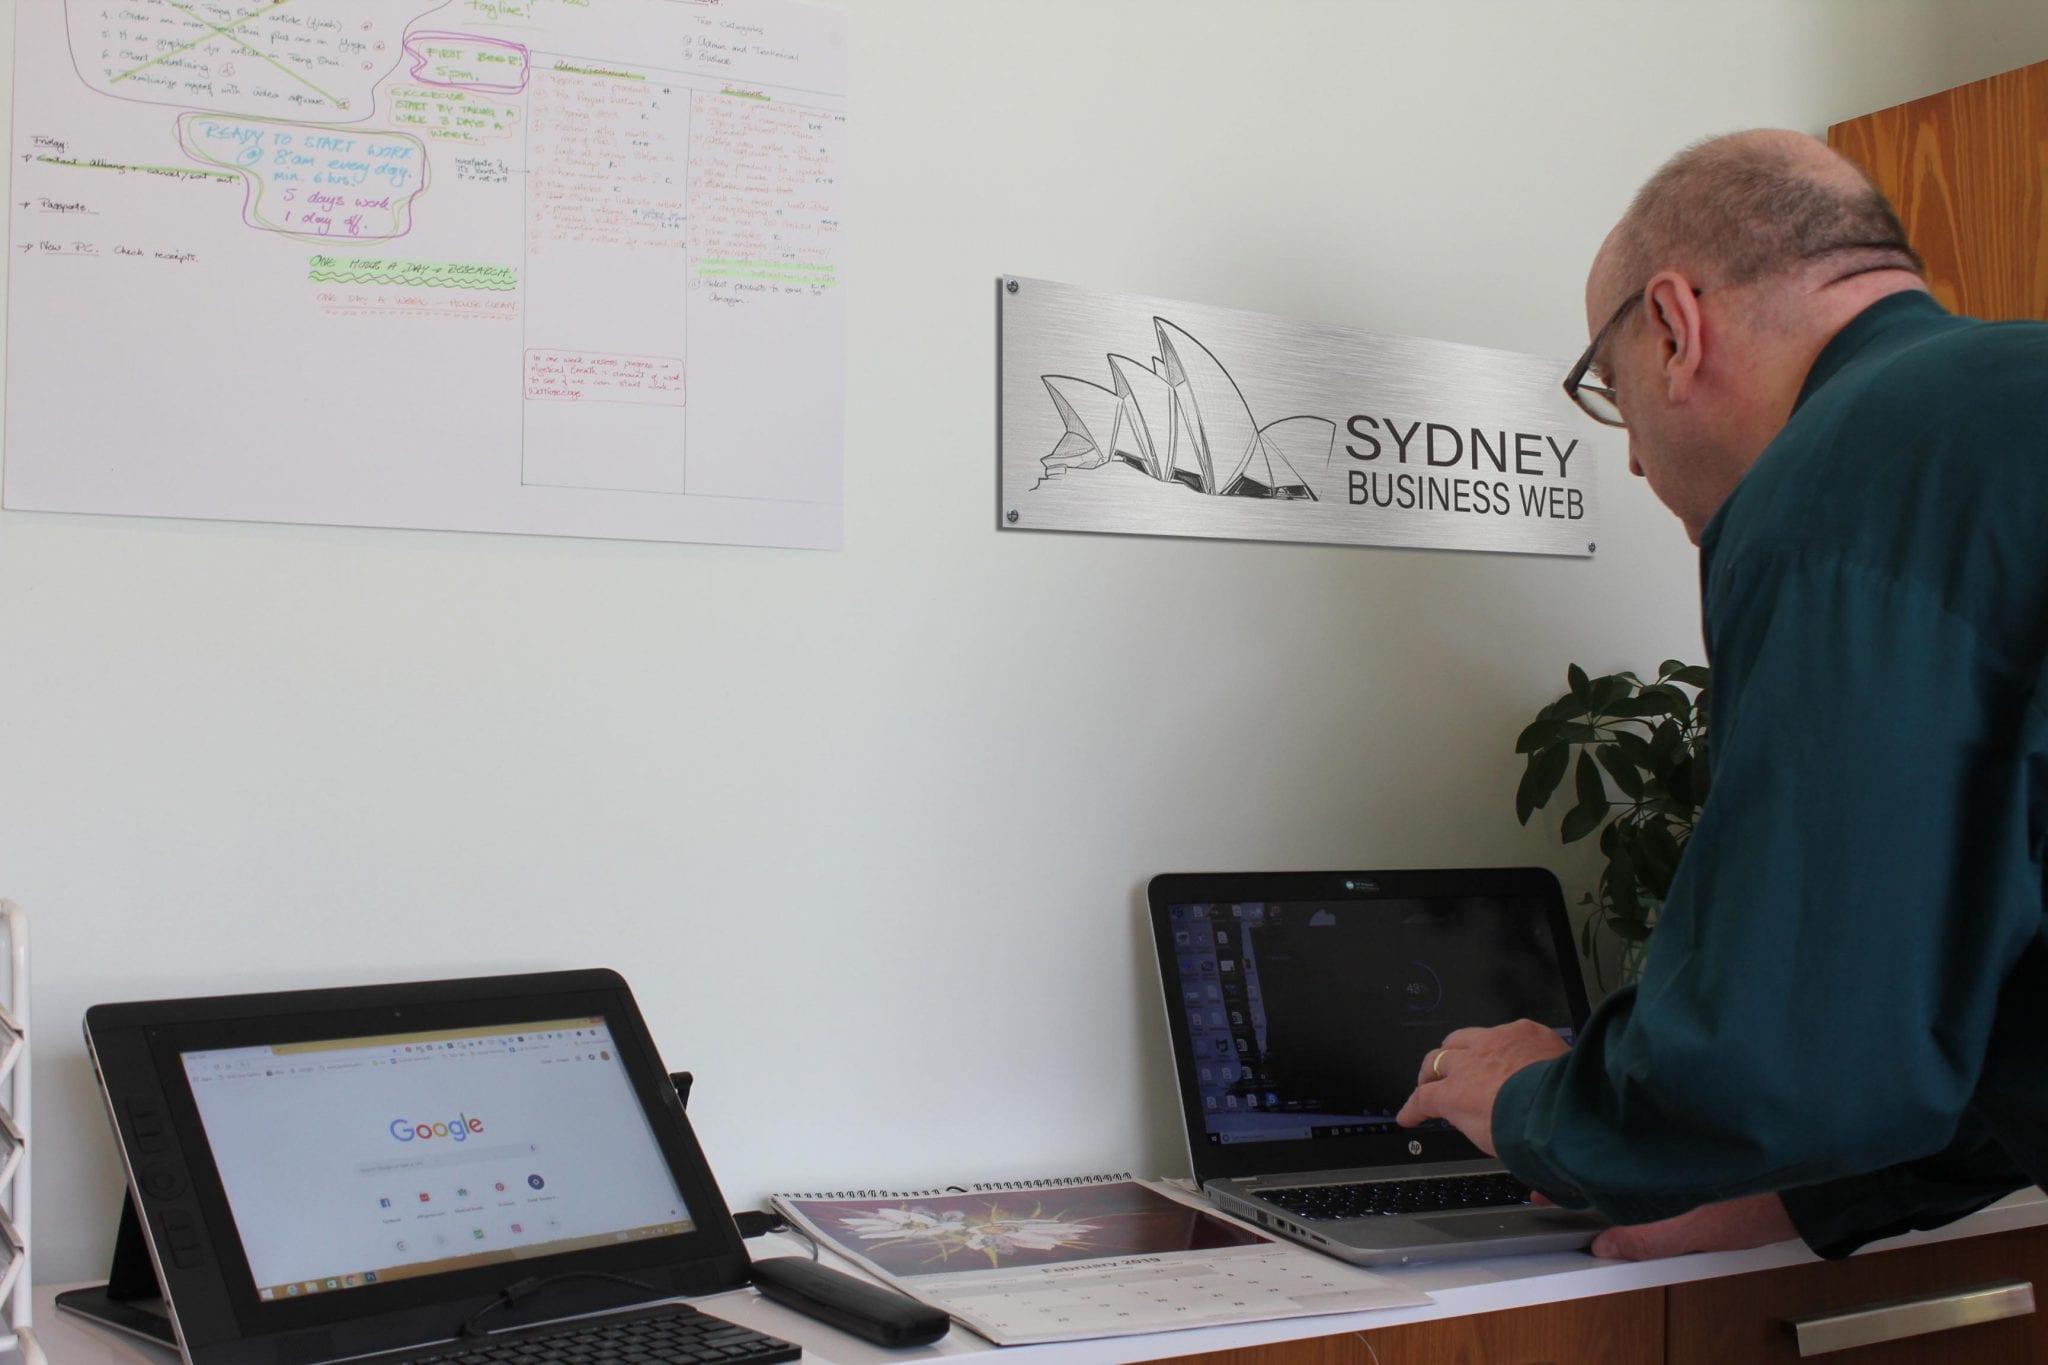 Sydney Business Web – Pinpoint Local Sydney